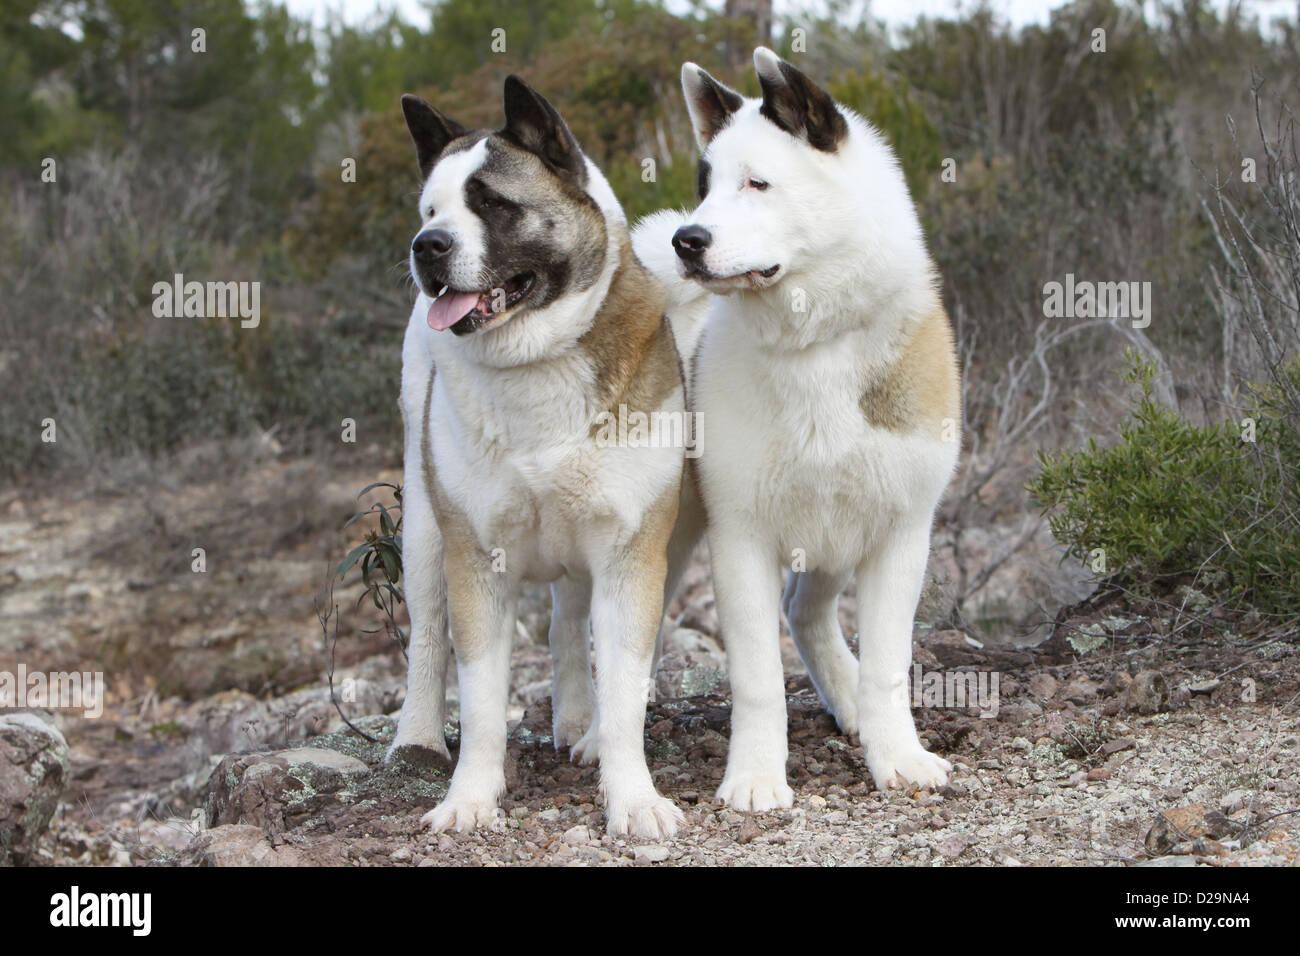 American Akita Dog | Breed Info | Characteristics | Traits